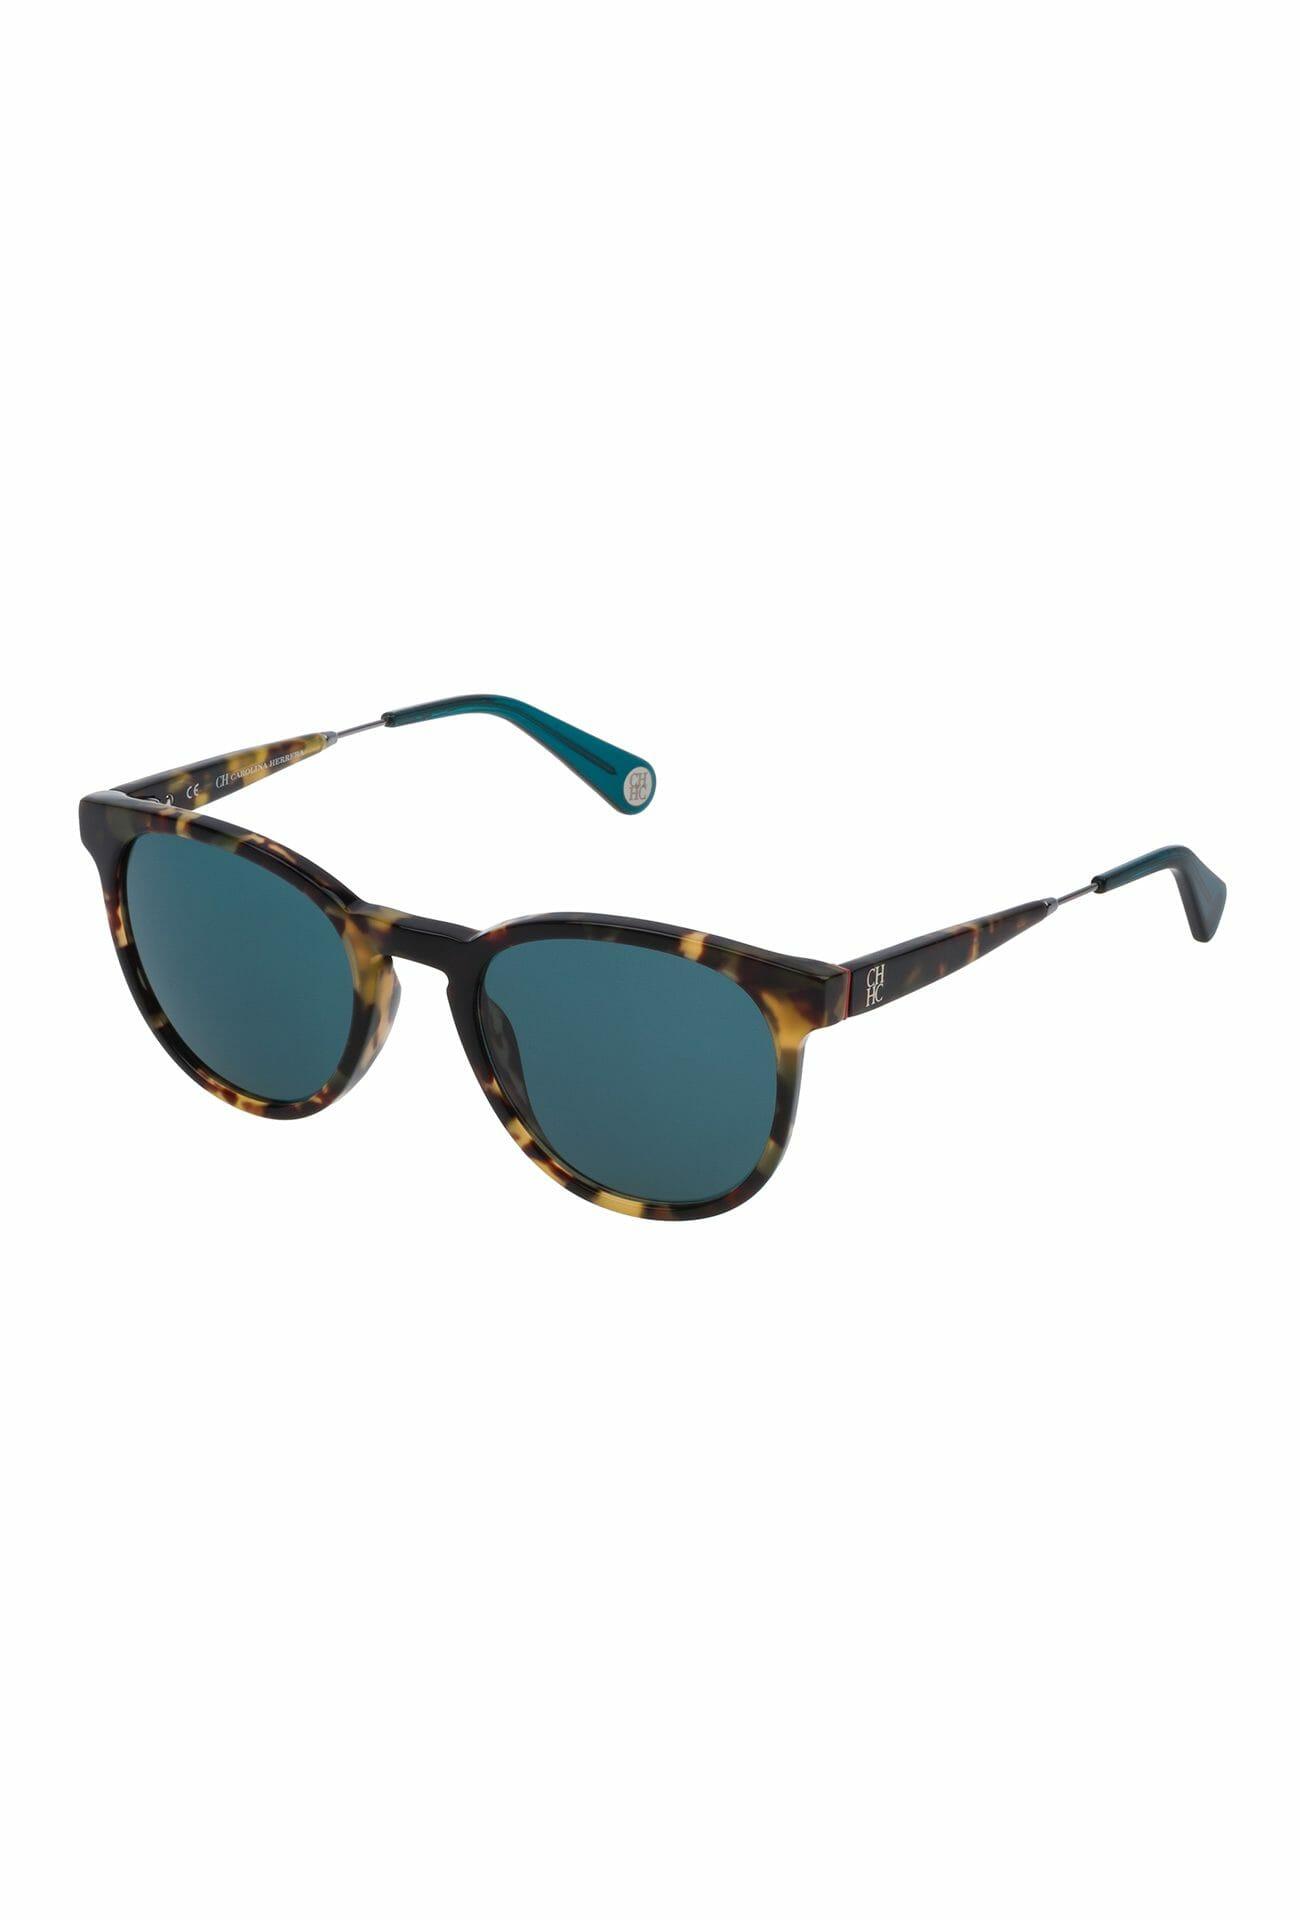 CH-Carolina-Herrera-Eyewear-Reference741-01